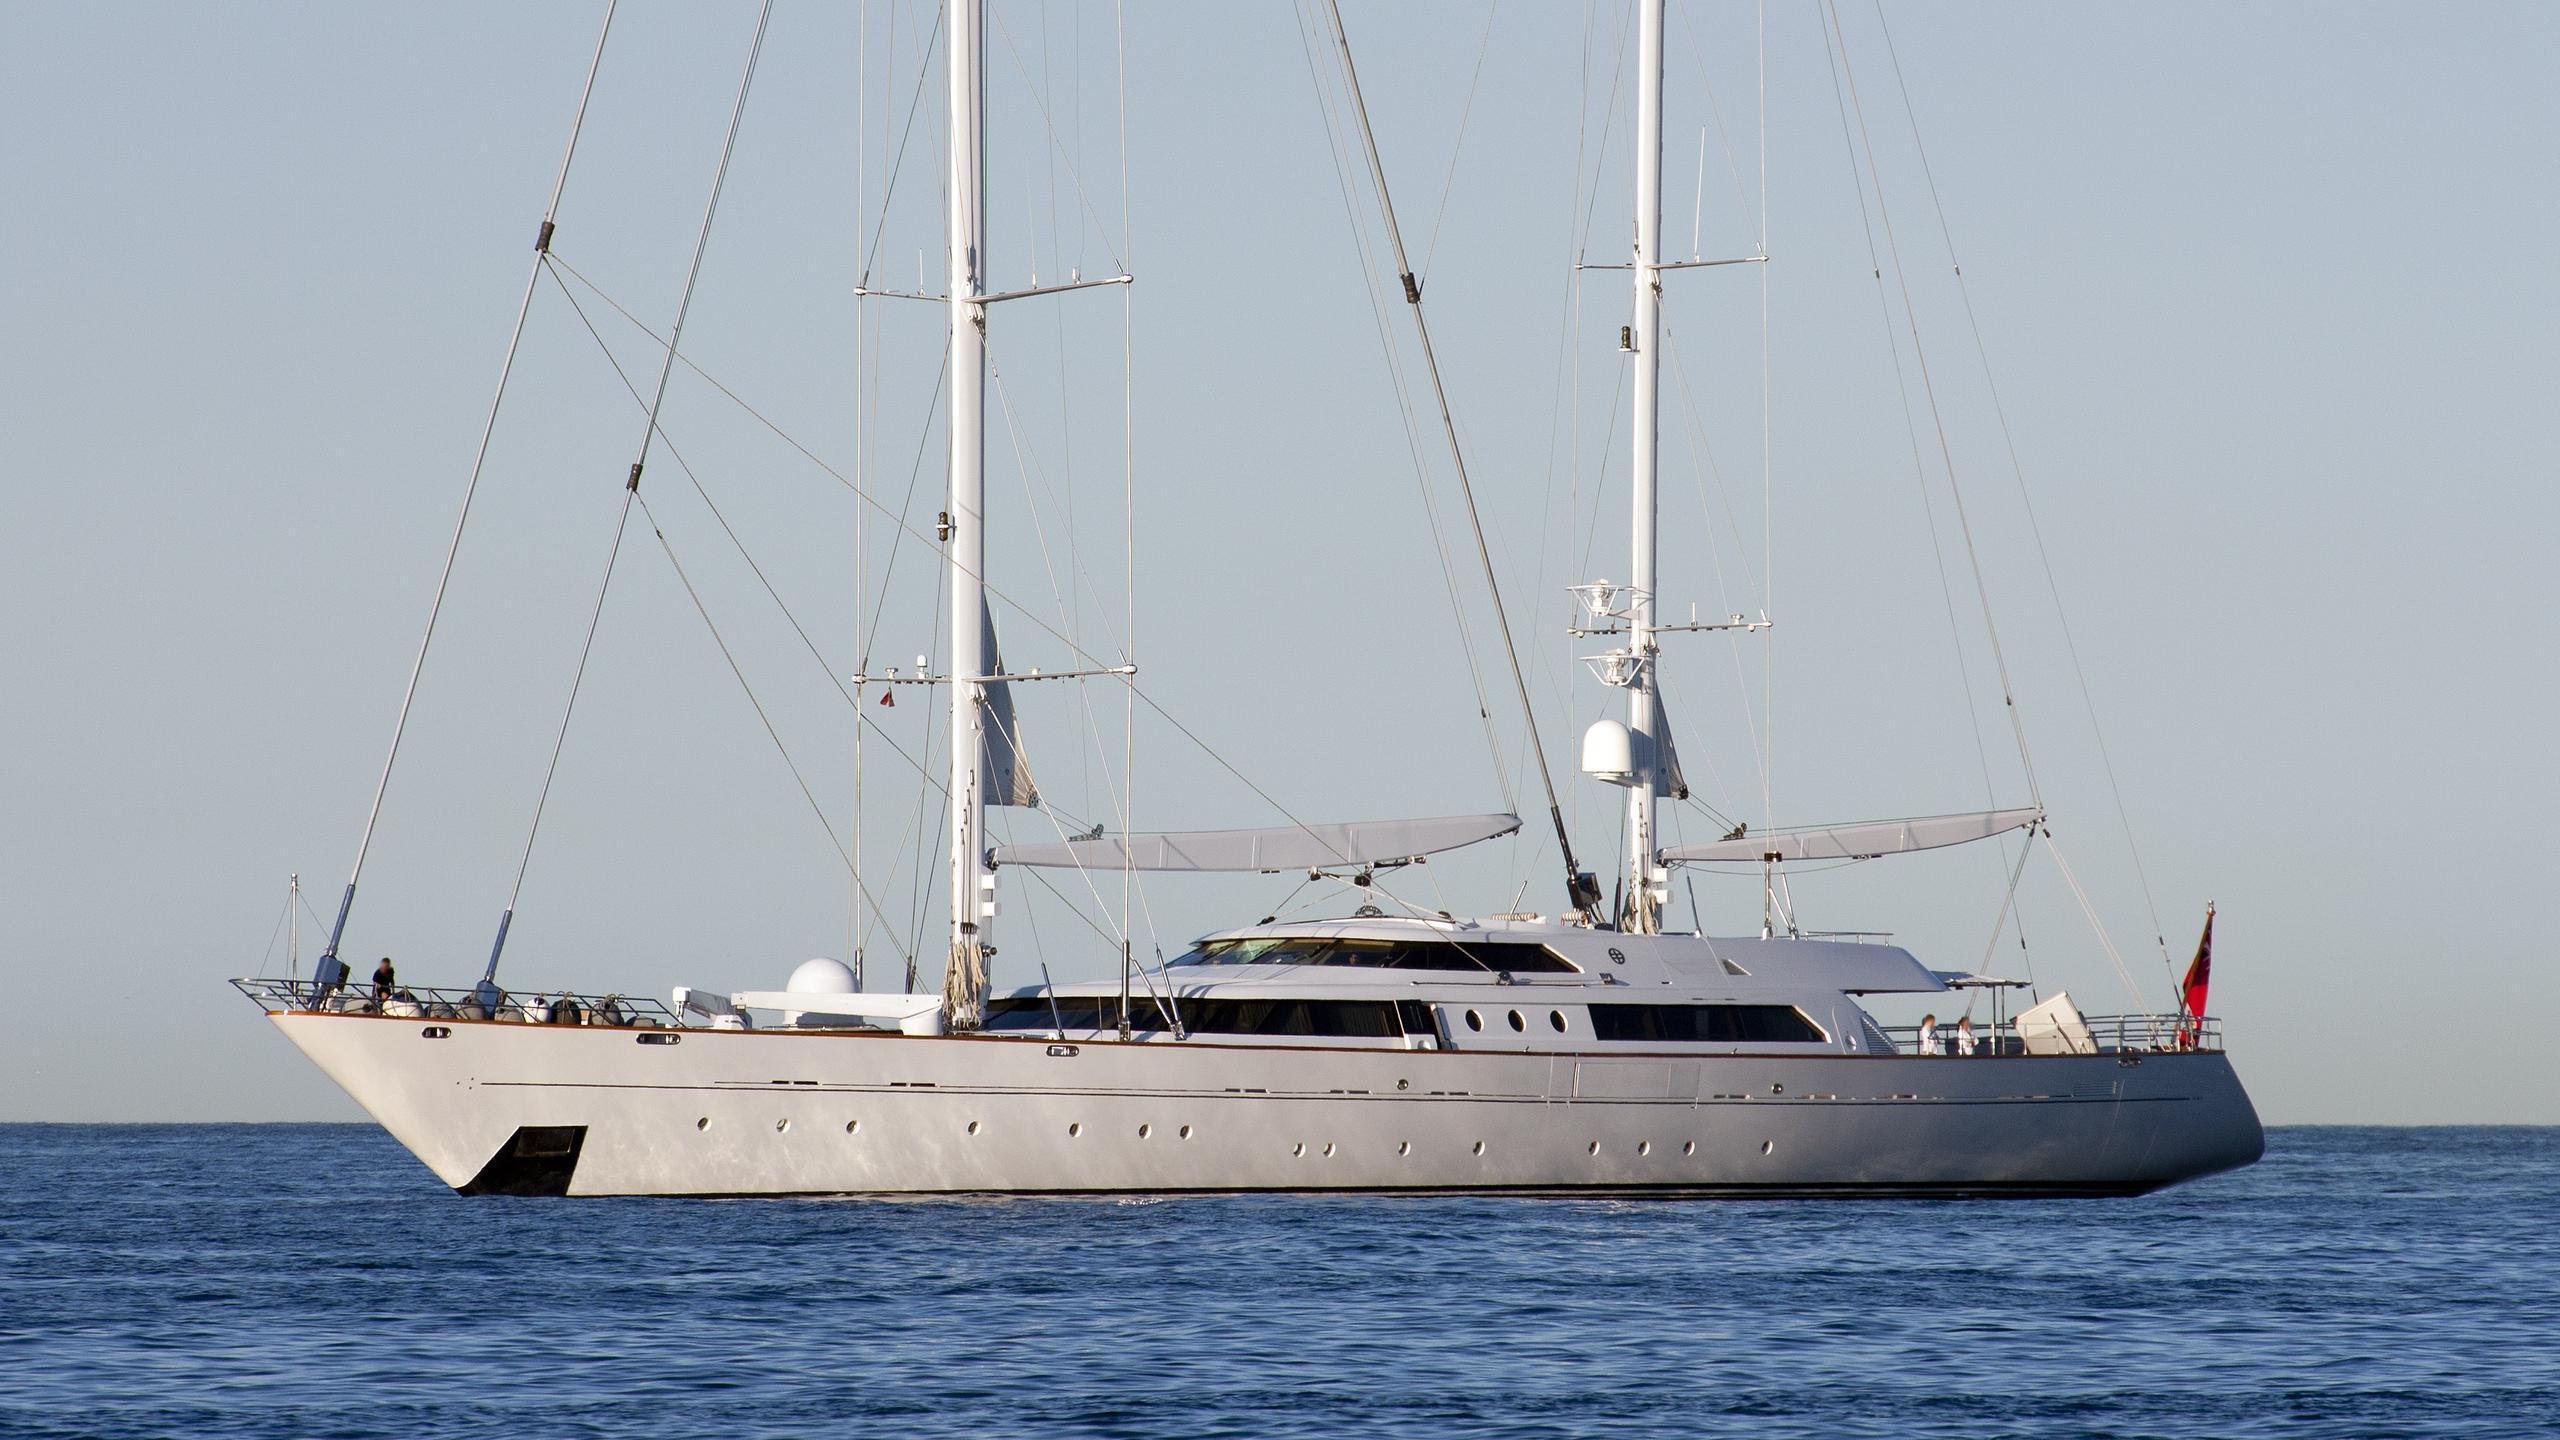 taouey-sailing-yacht-perini-navi-1994-59m-profile